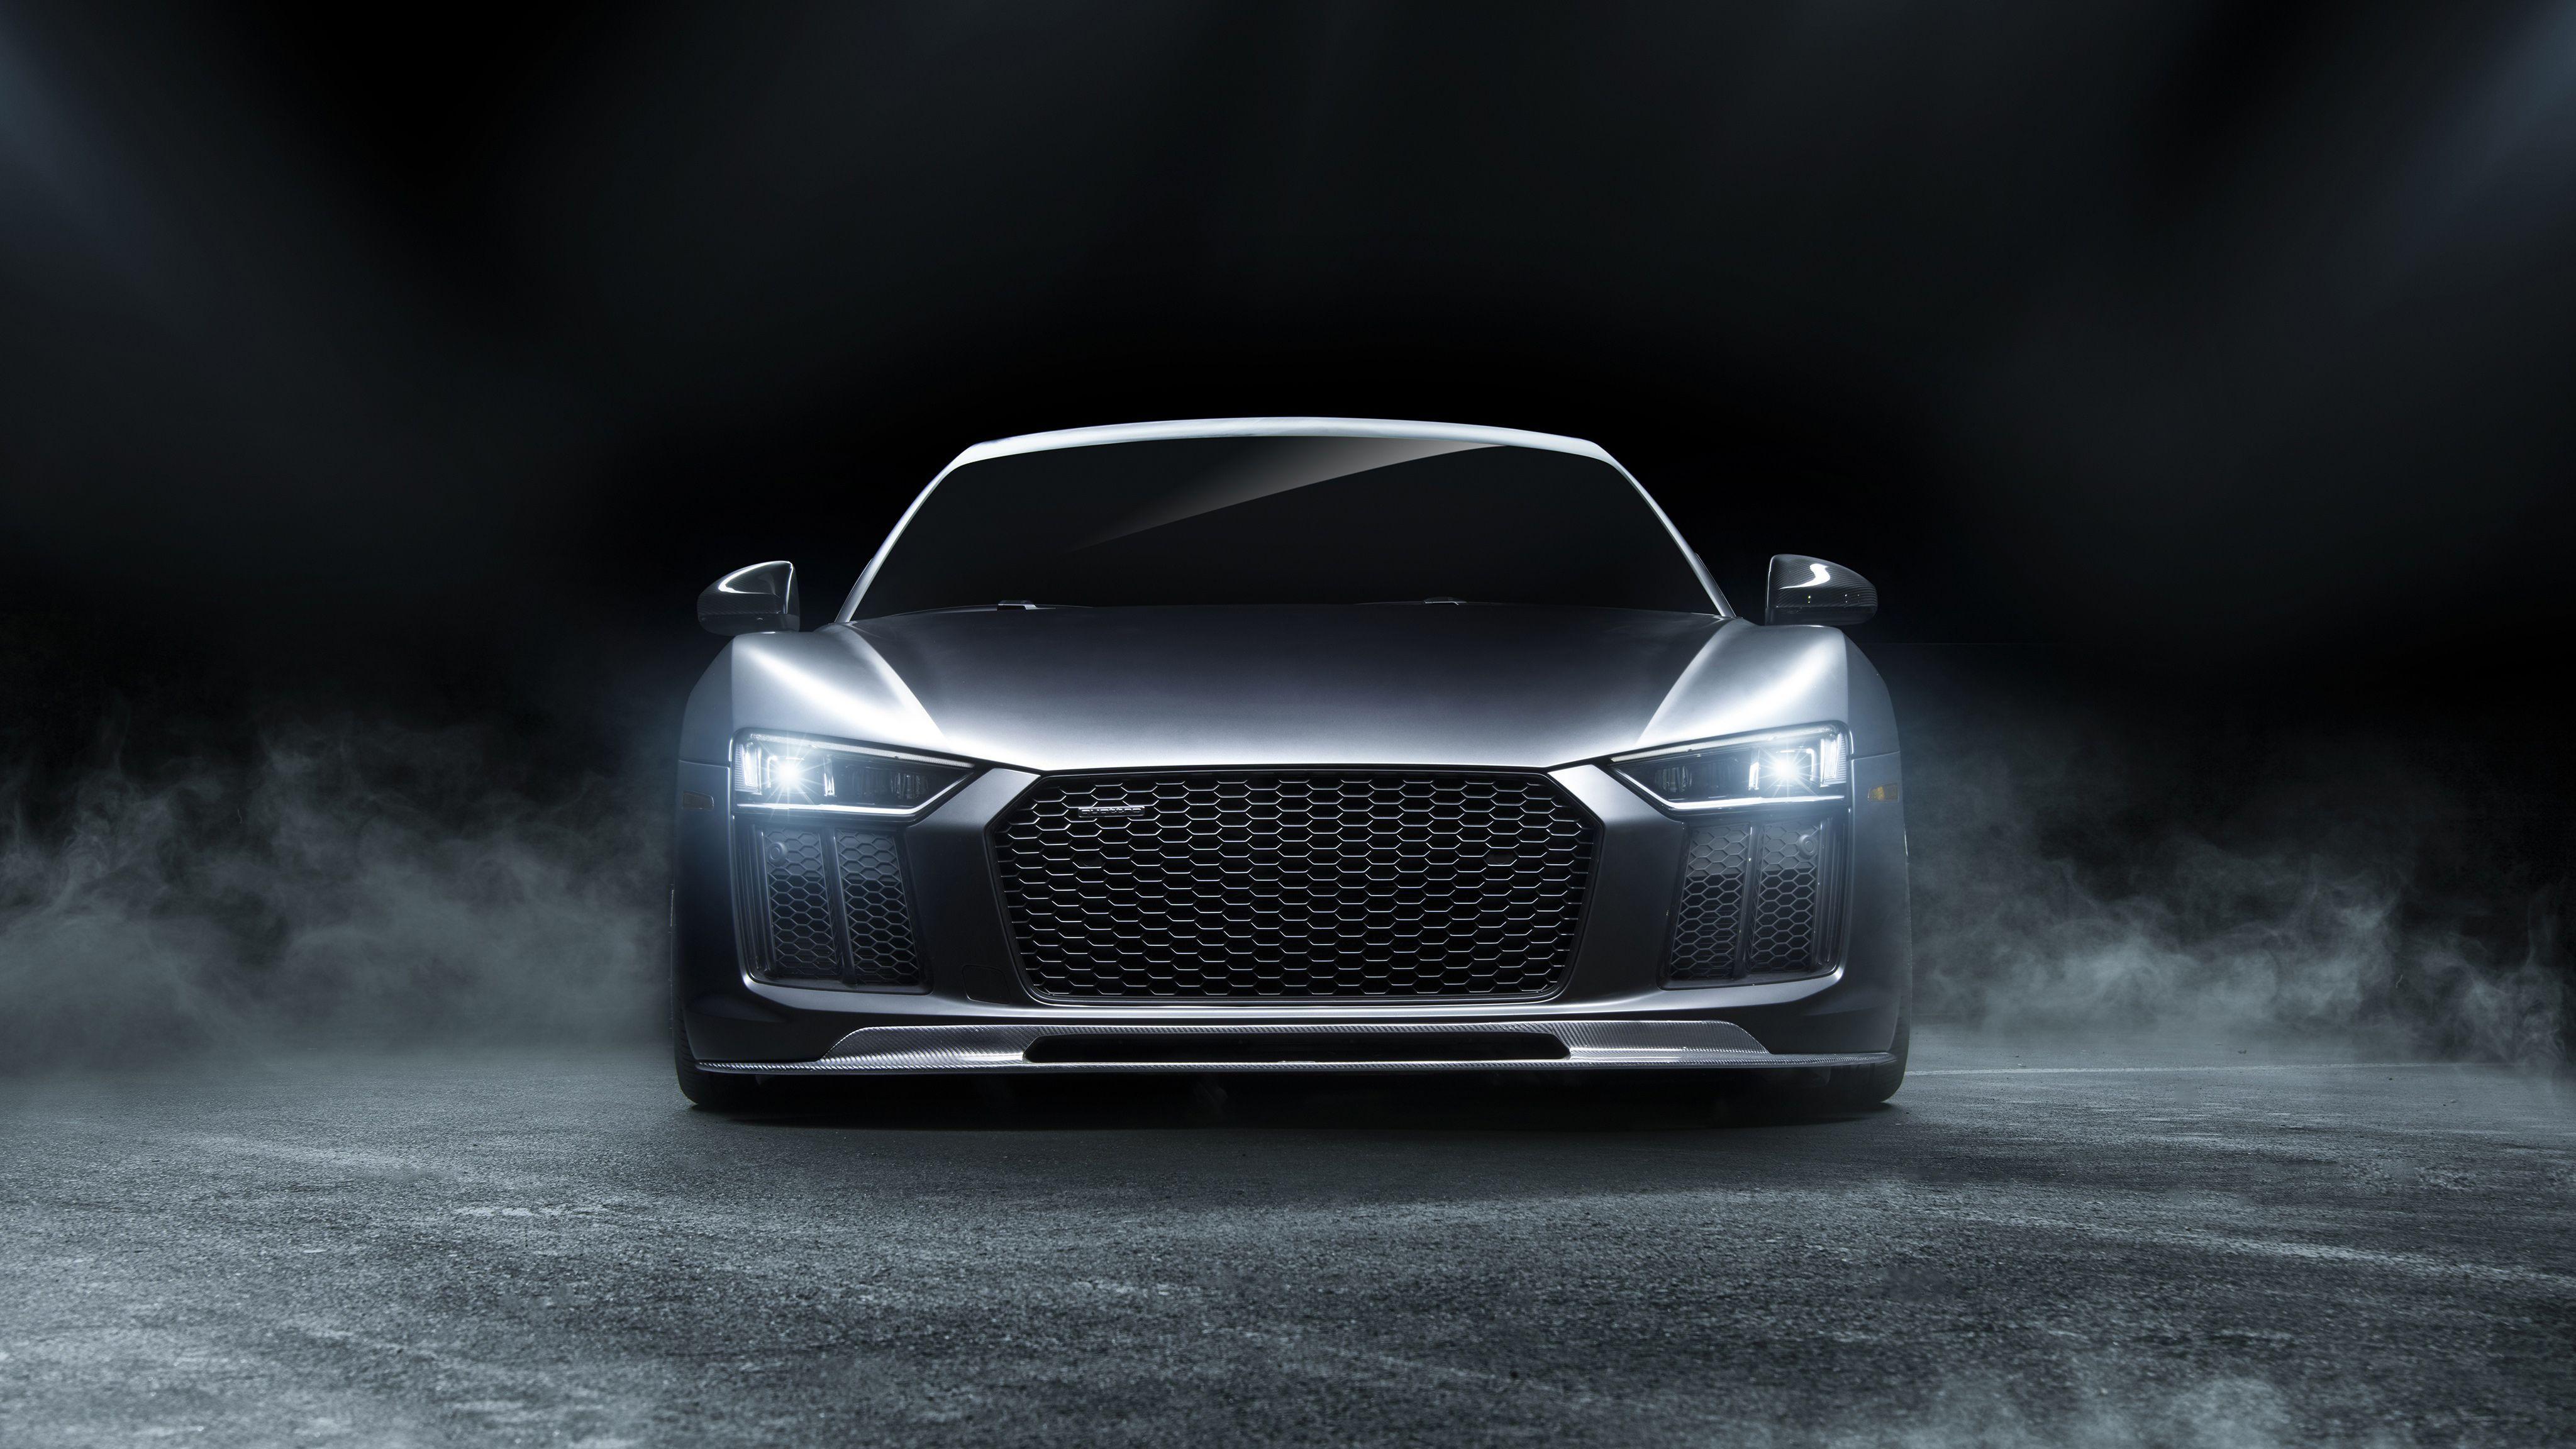 Audi Desktop Wallpapers Top Free Audi Desktop Backgrounds Wallpaperaccess